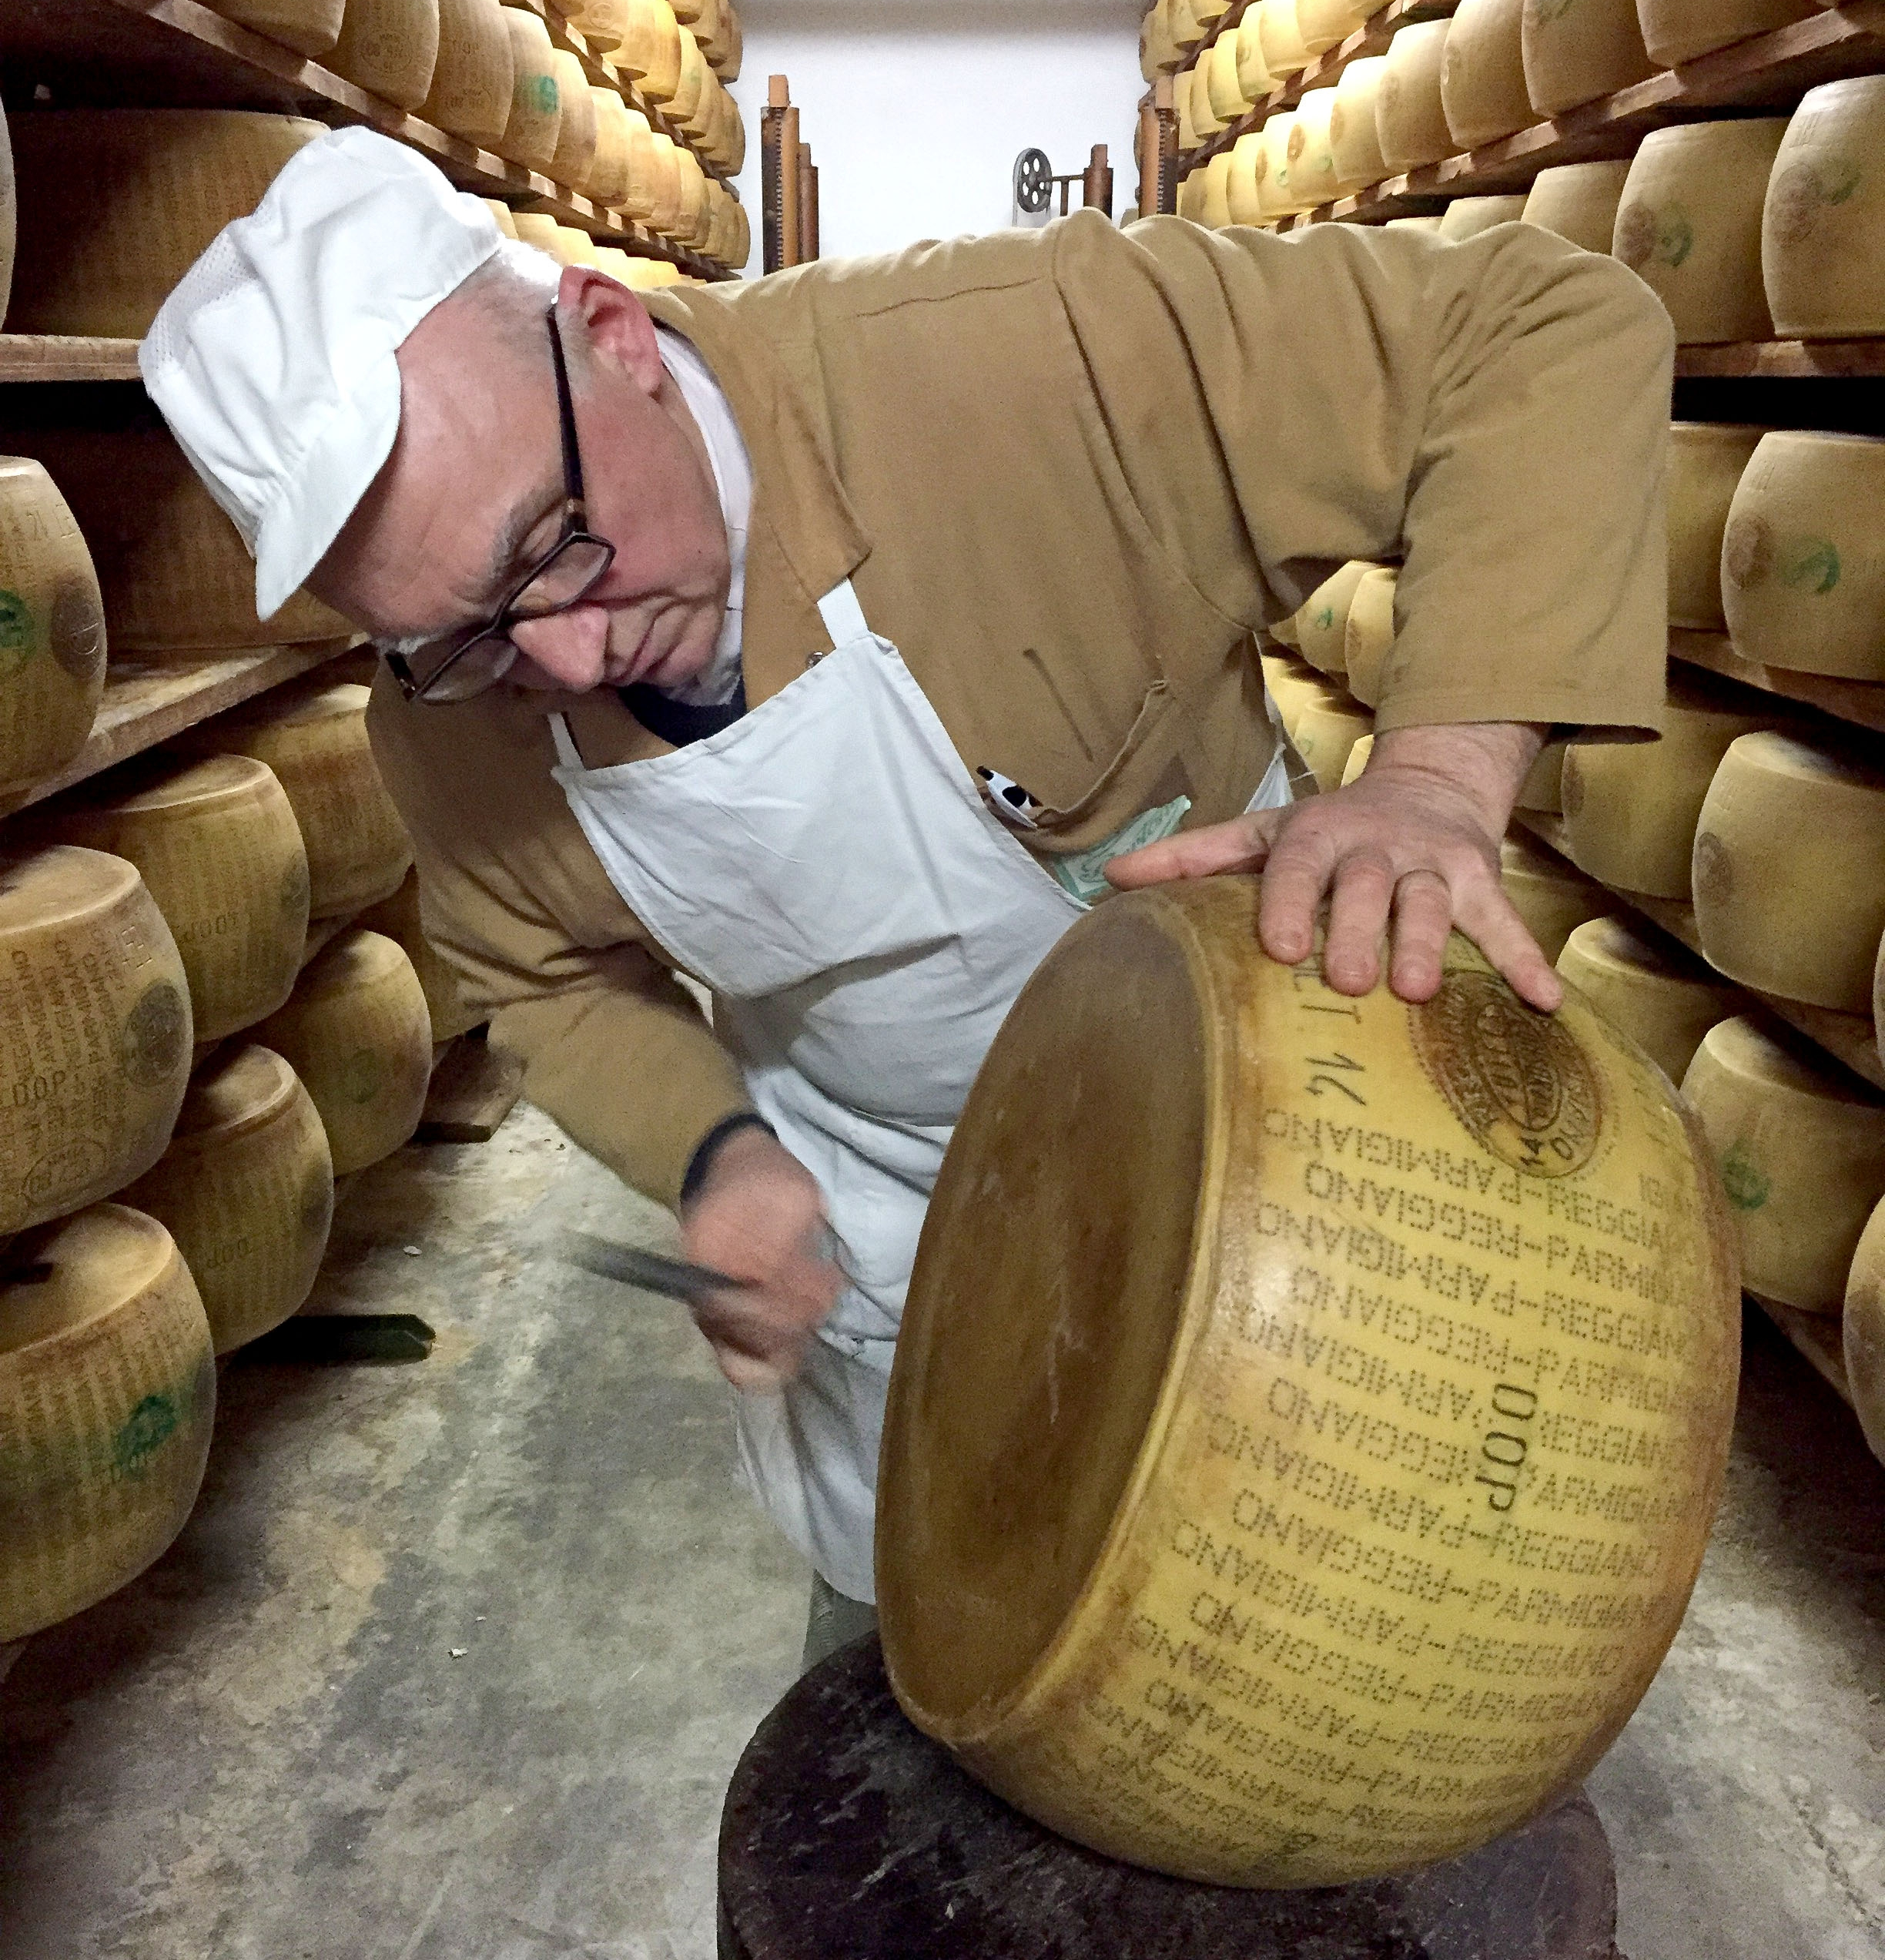 Hammering Parmigiano-Reggiano. Photo: Patricia Michelson.